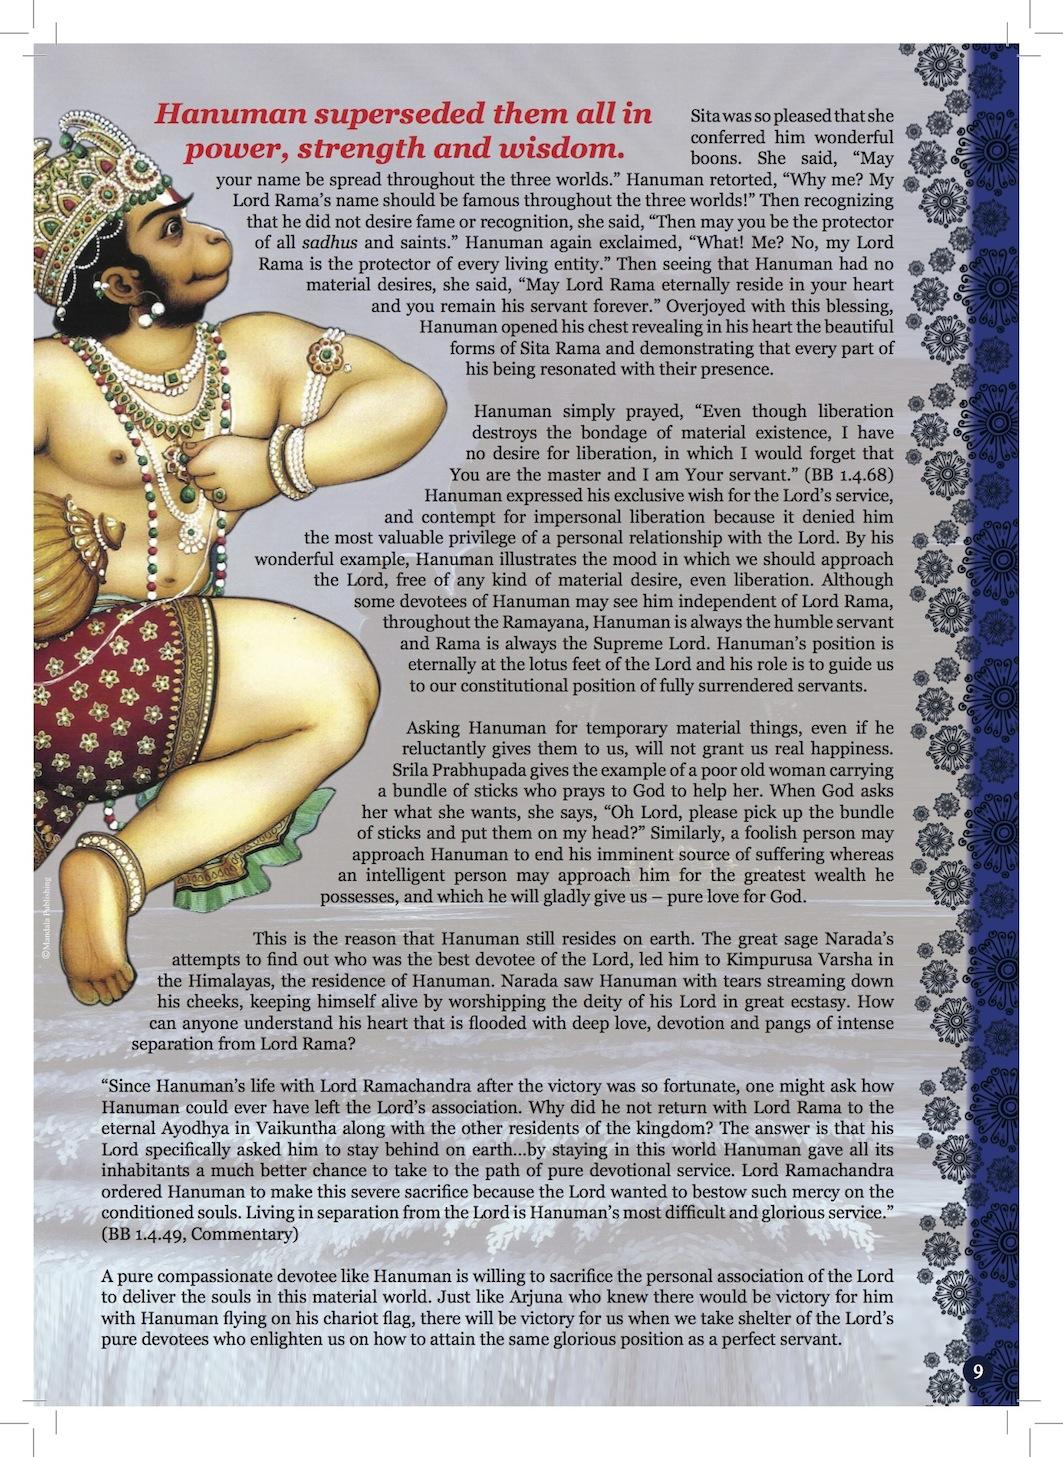 Hanuman 2